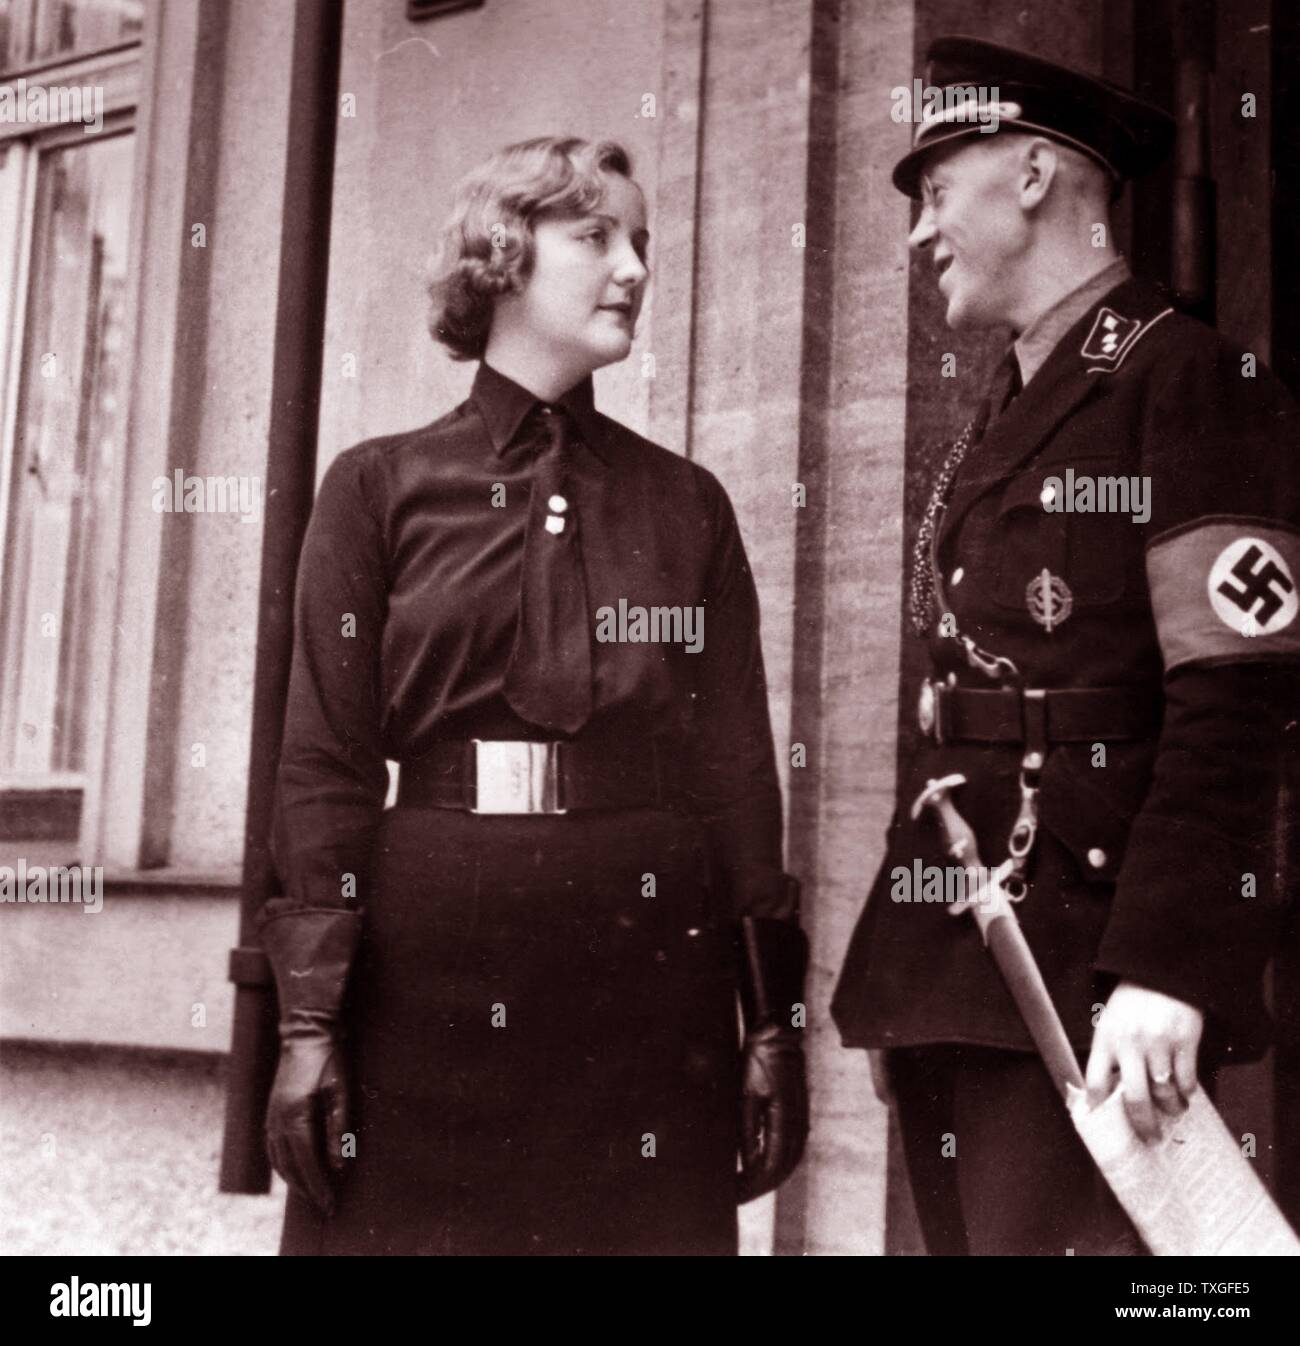 British Fascist High Resolution Stock ...